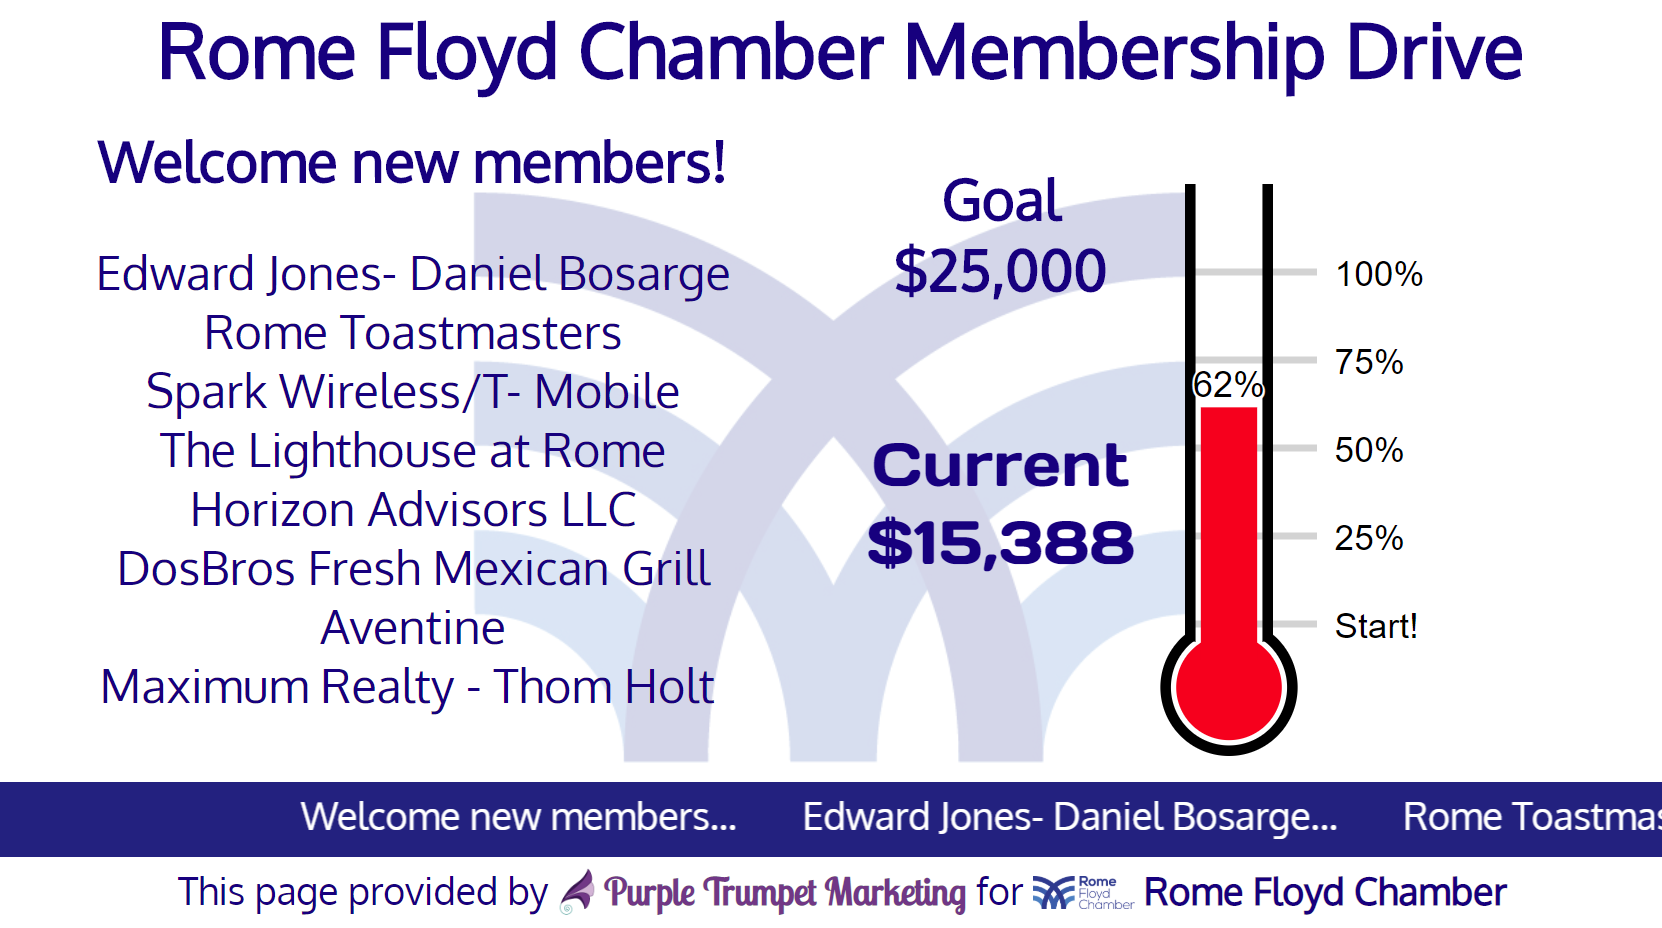 Membership Campaign 2019 Rome Floyd Chamber